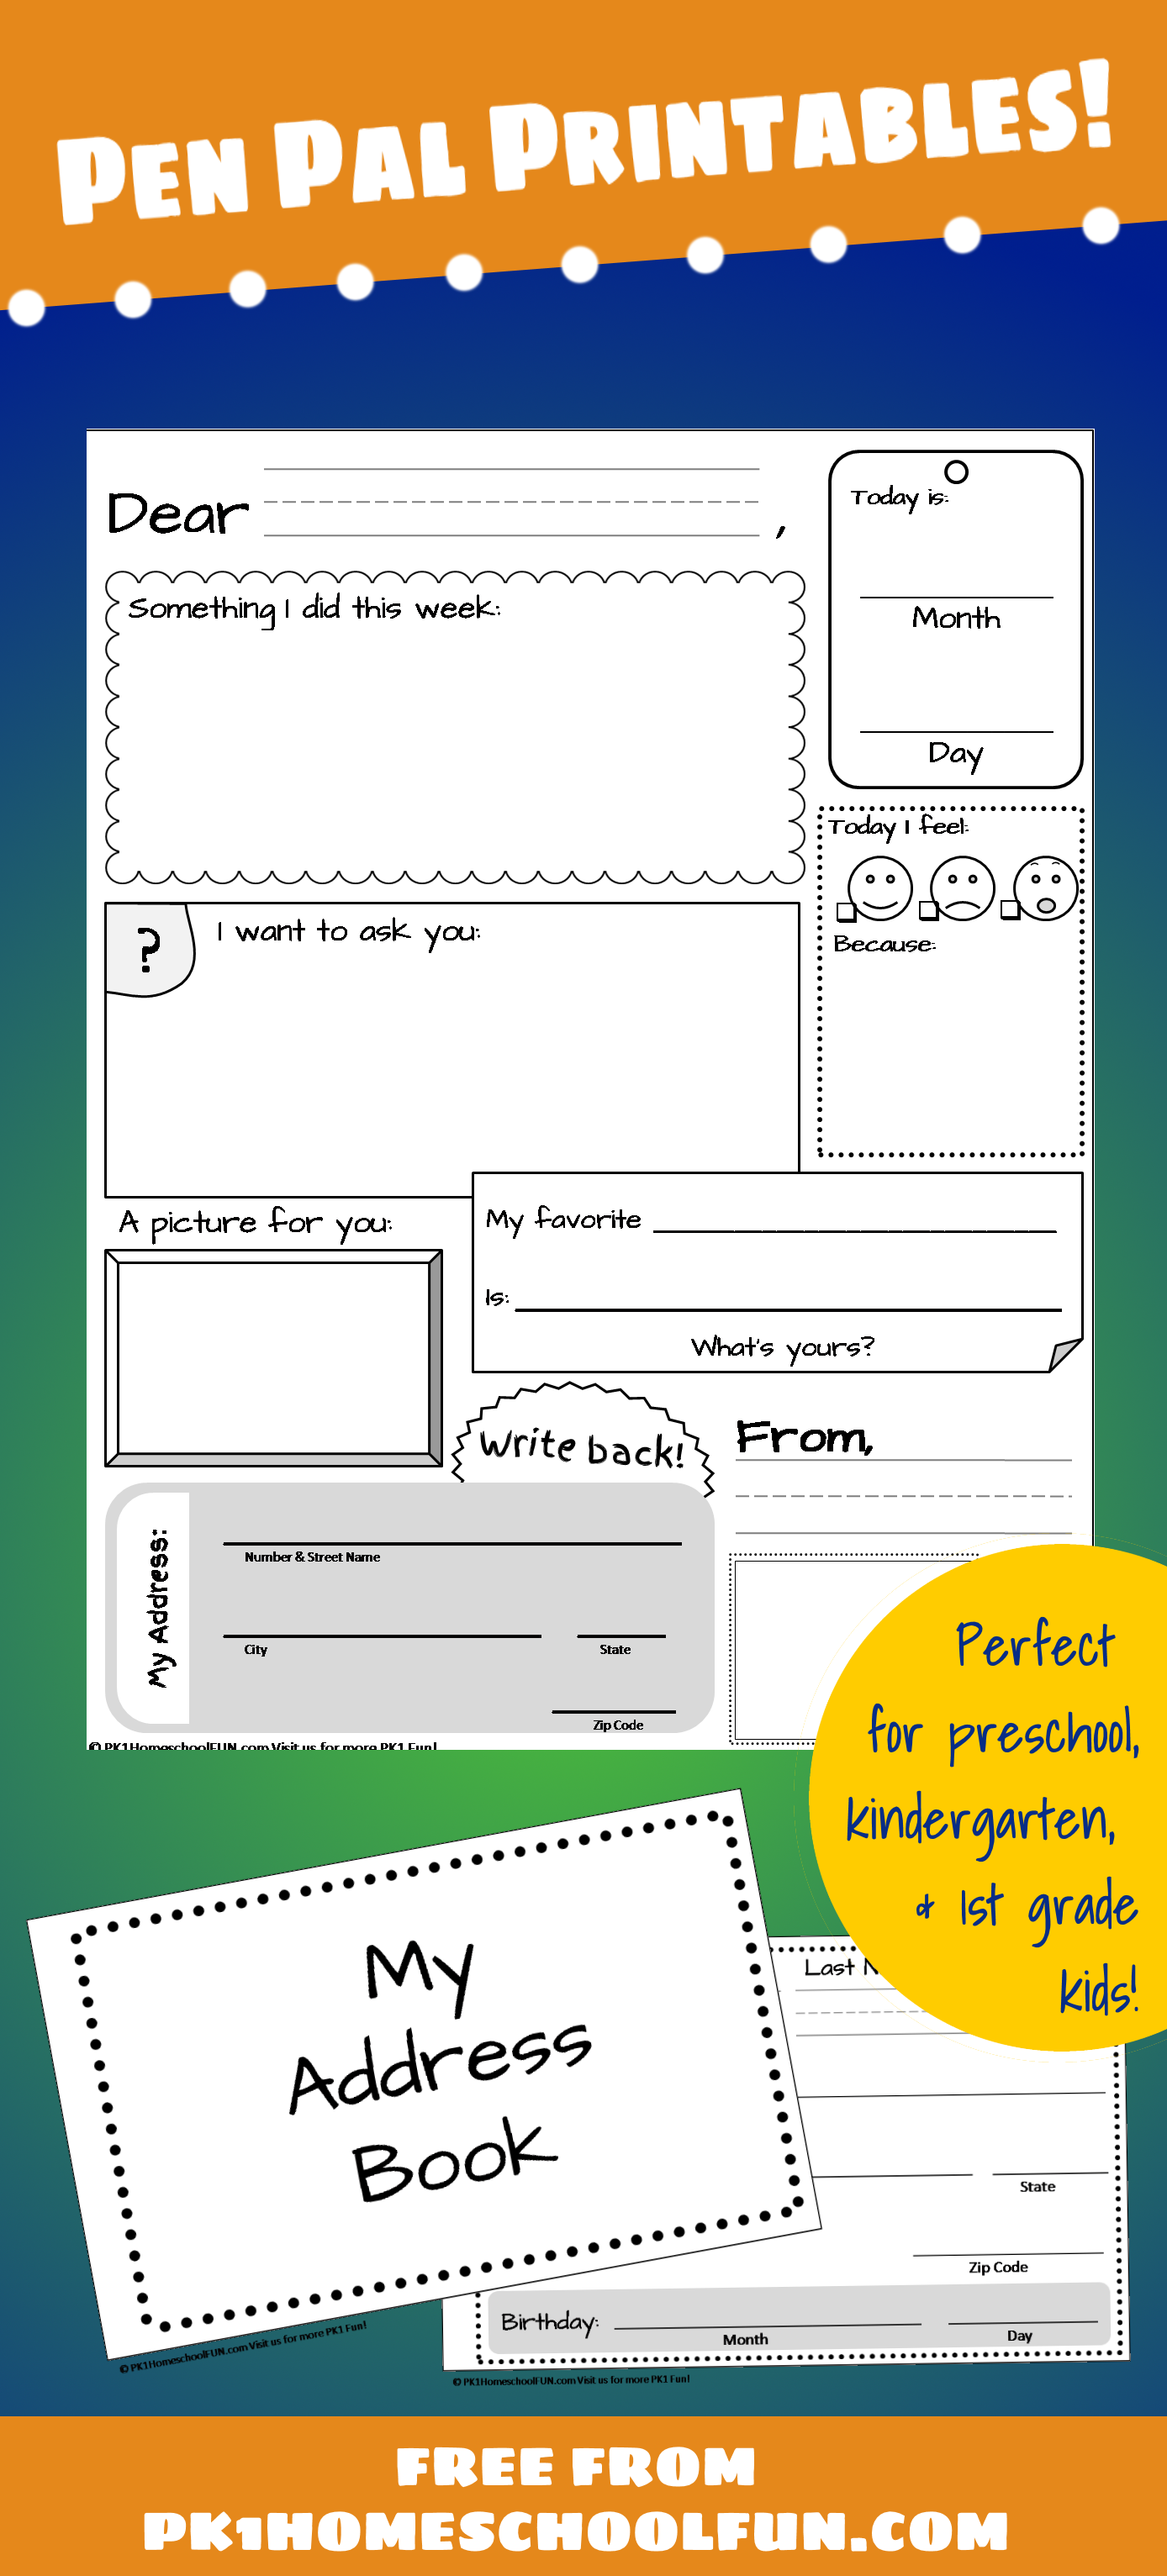 Free Pen Pal Printables For Kids